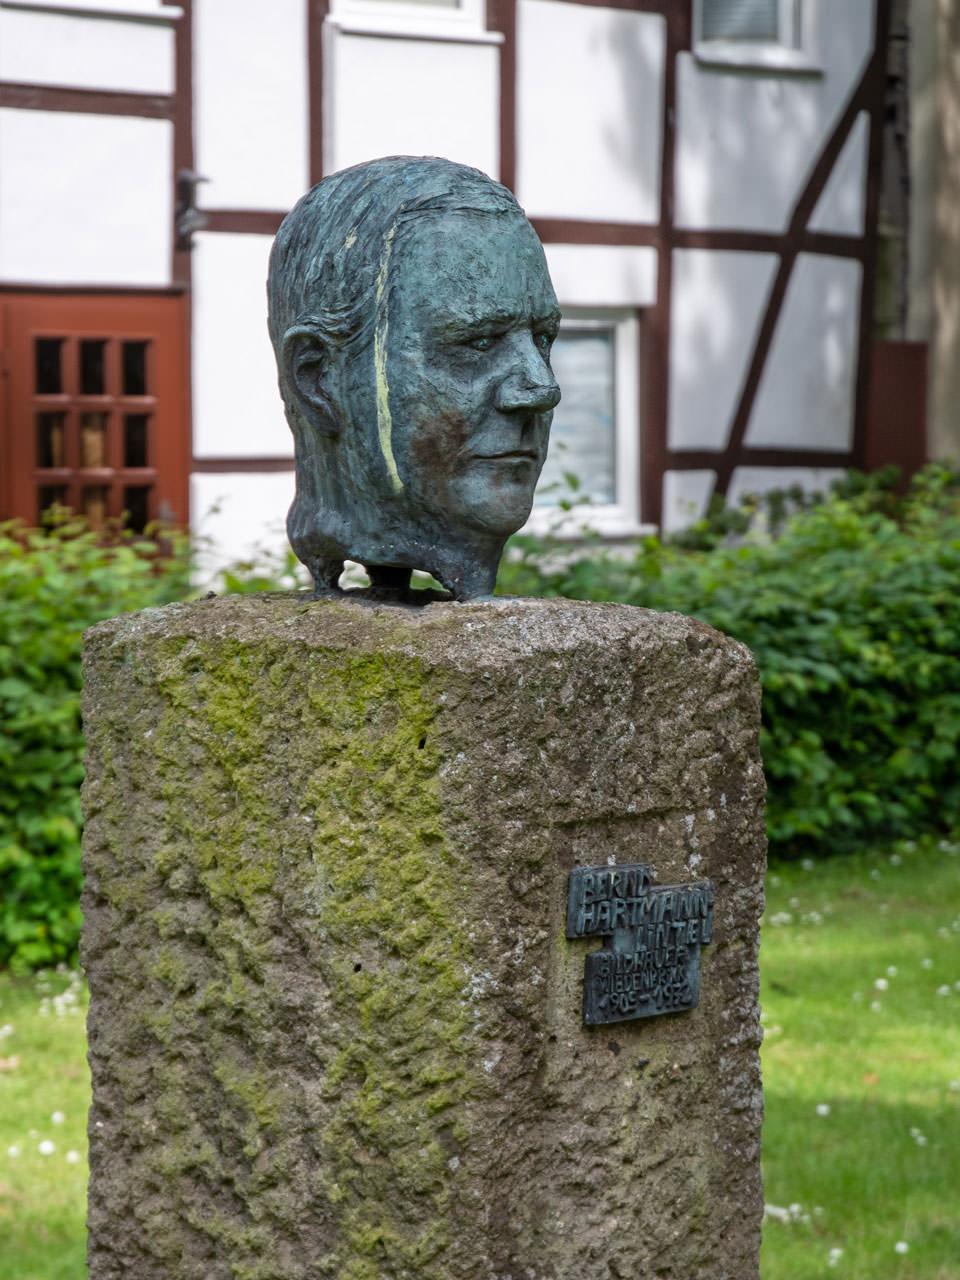 Porträtkopf von Bernd HartmannHartmann Denkmal